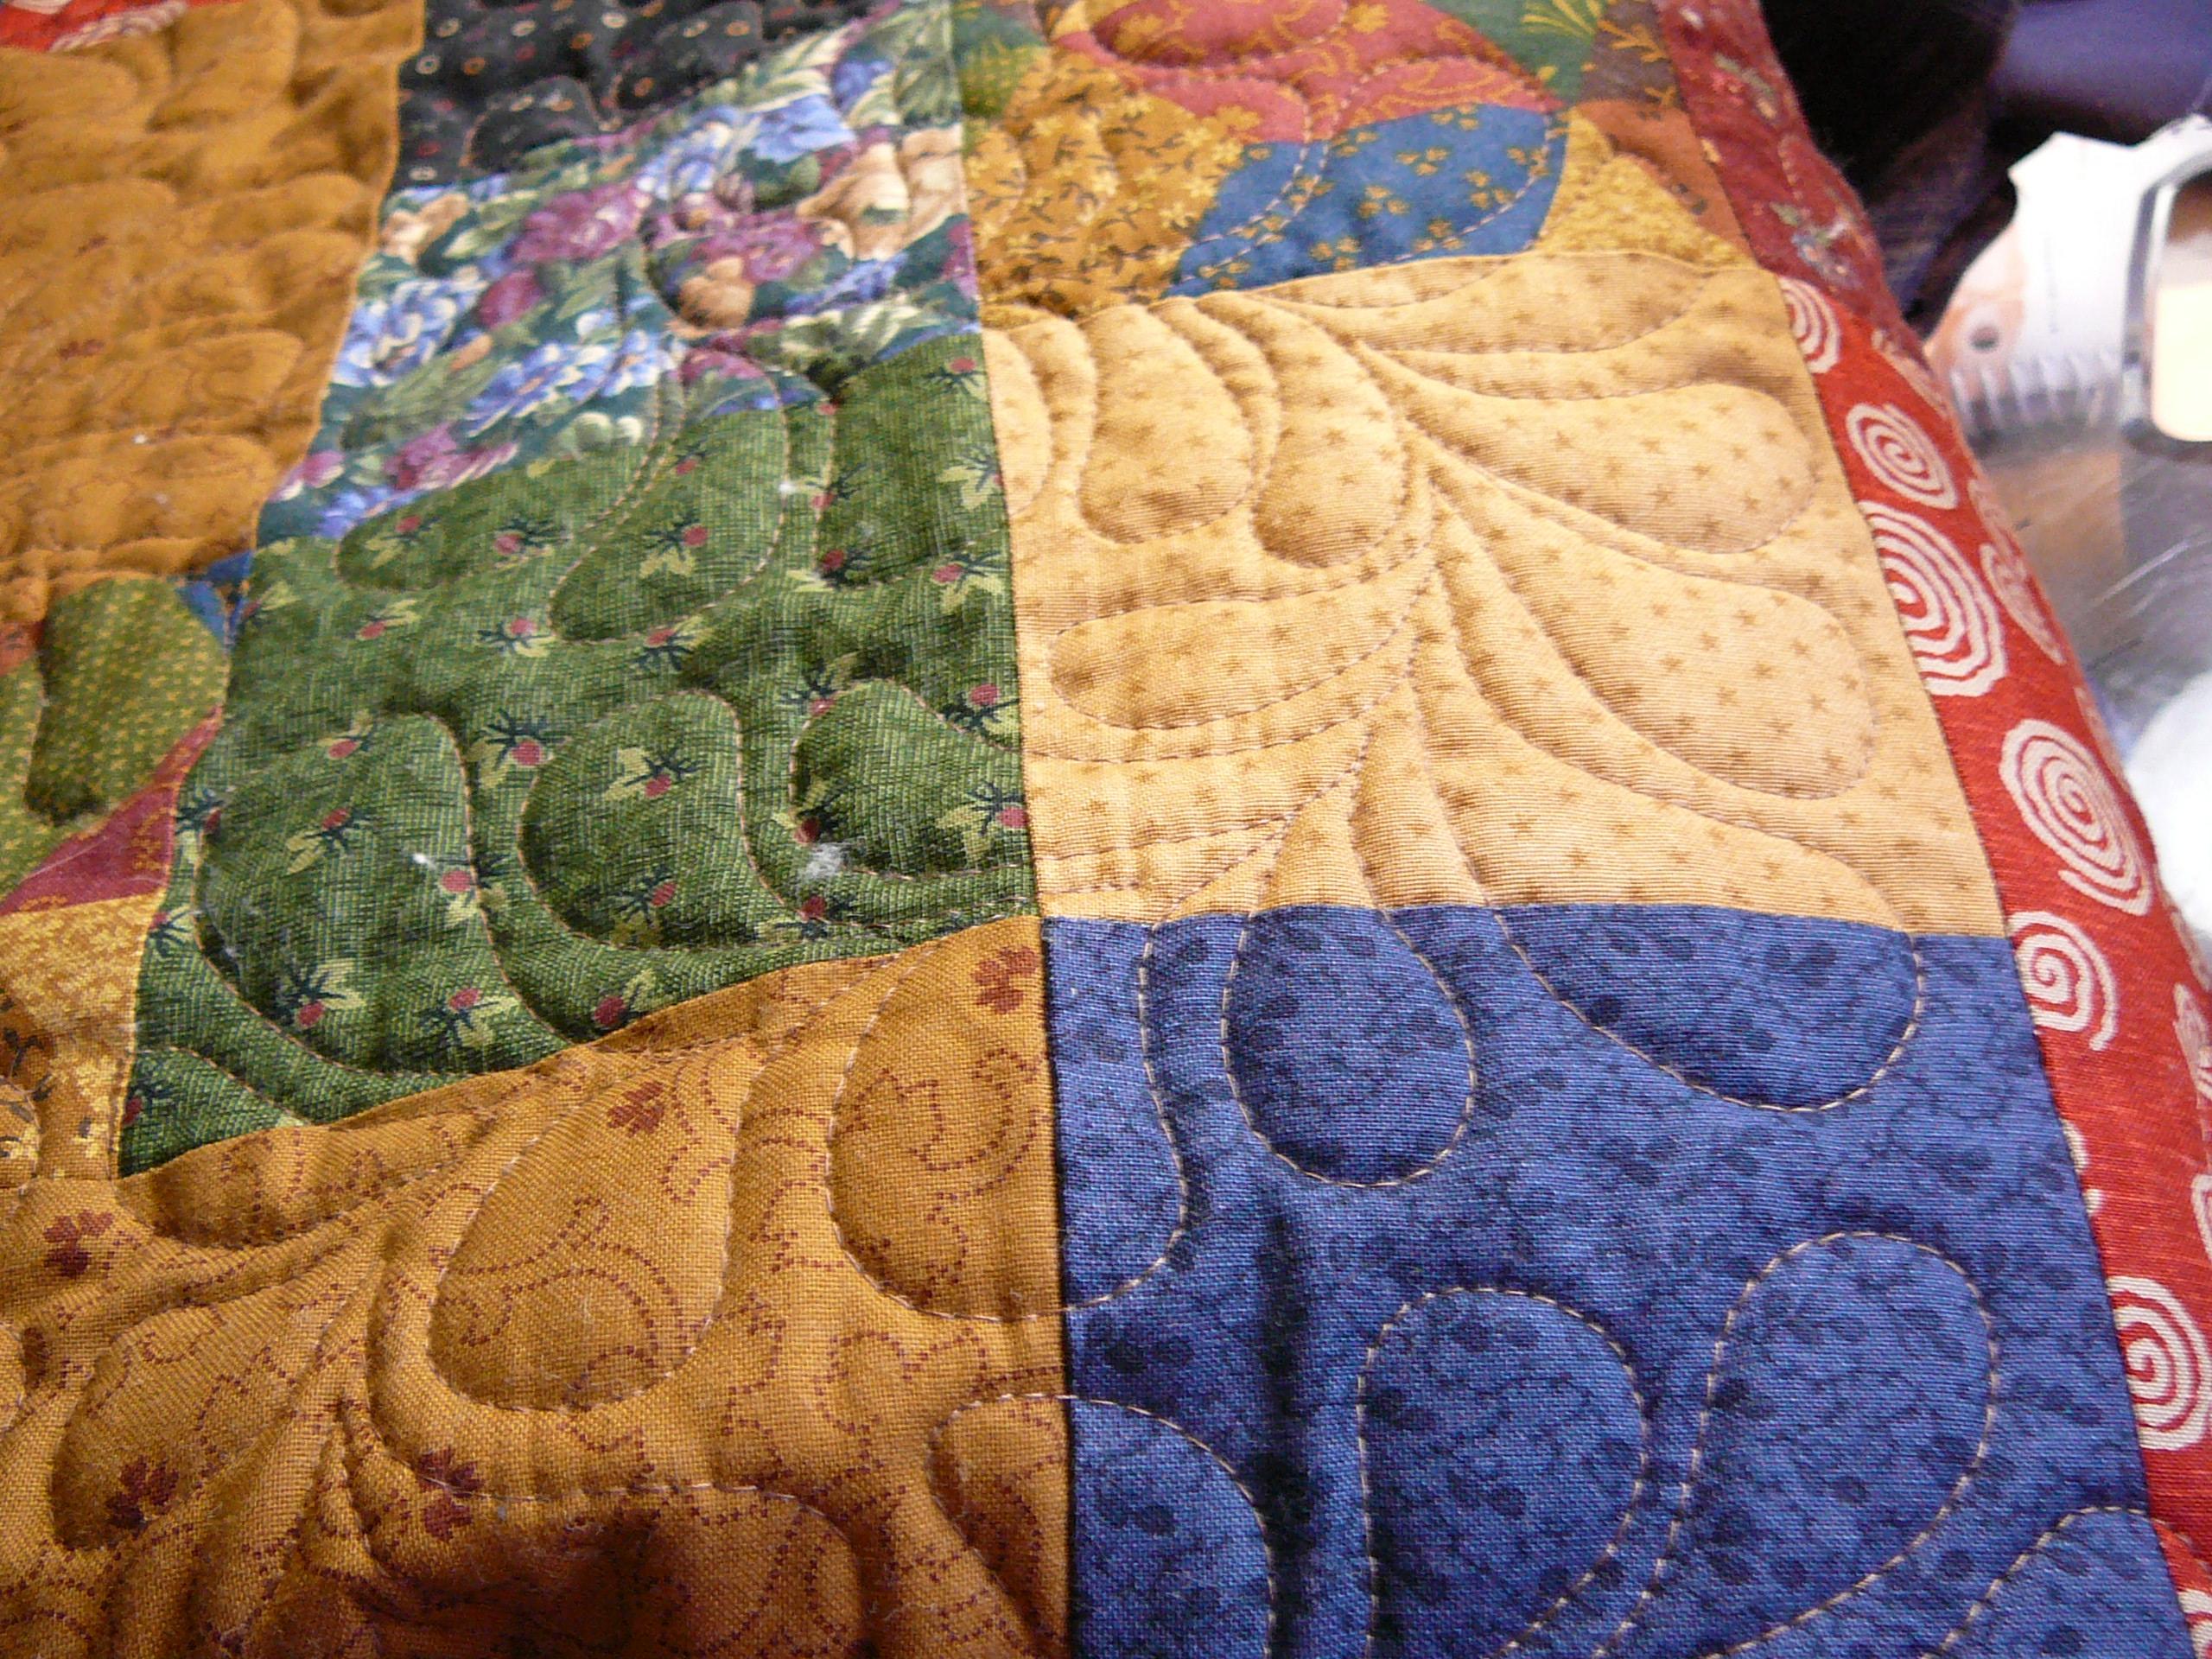 Favorite quilt patterns for men : quilt patterns for men - Adamdwight.com